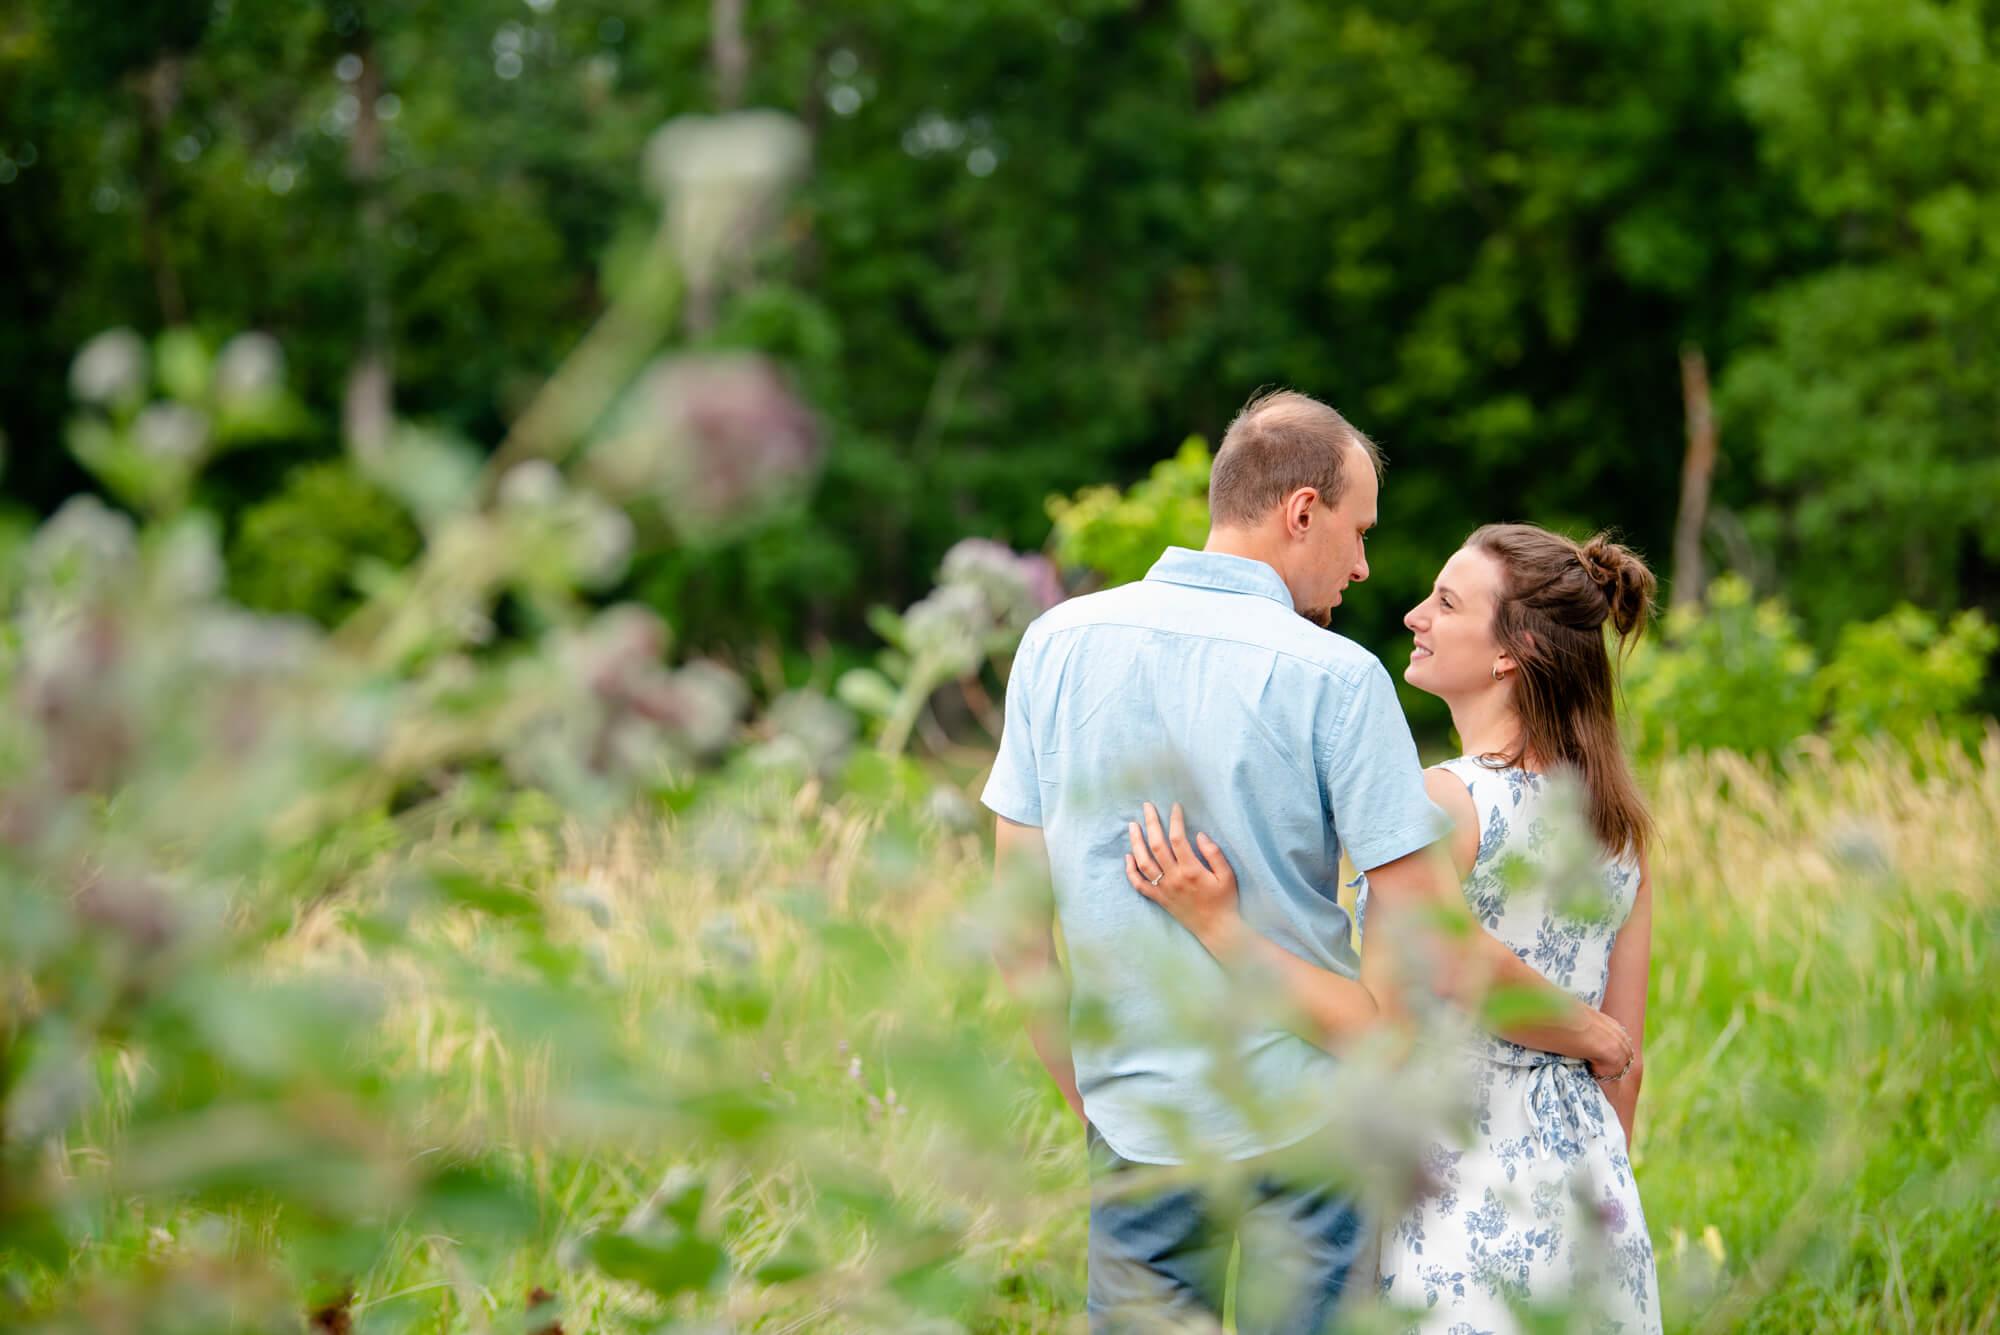 DSC 4772 - John and Faith's Engagement   Fargo, North Dakota